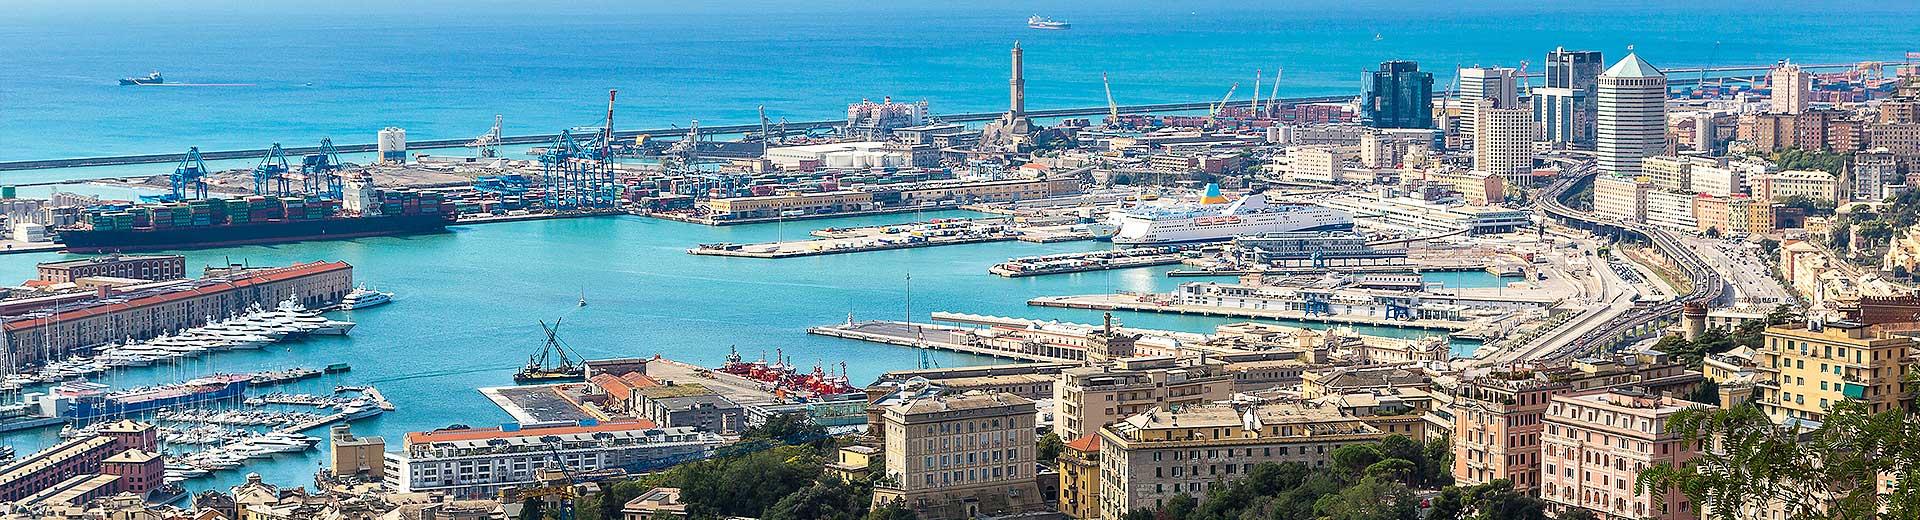 Städtereise Genua